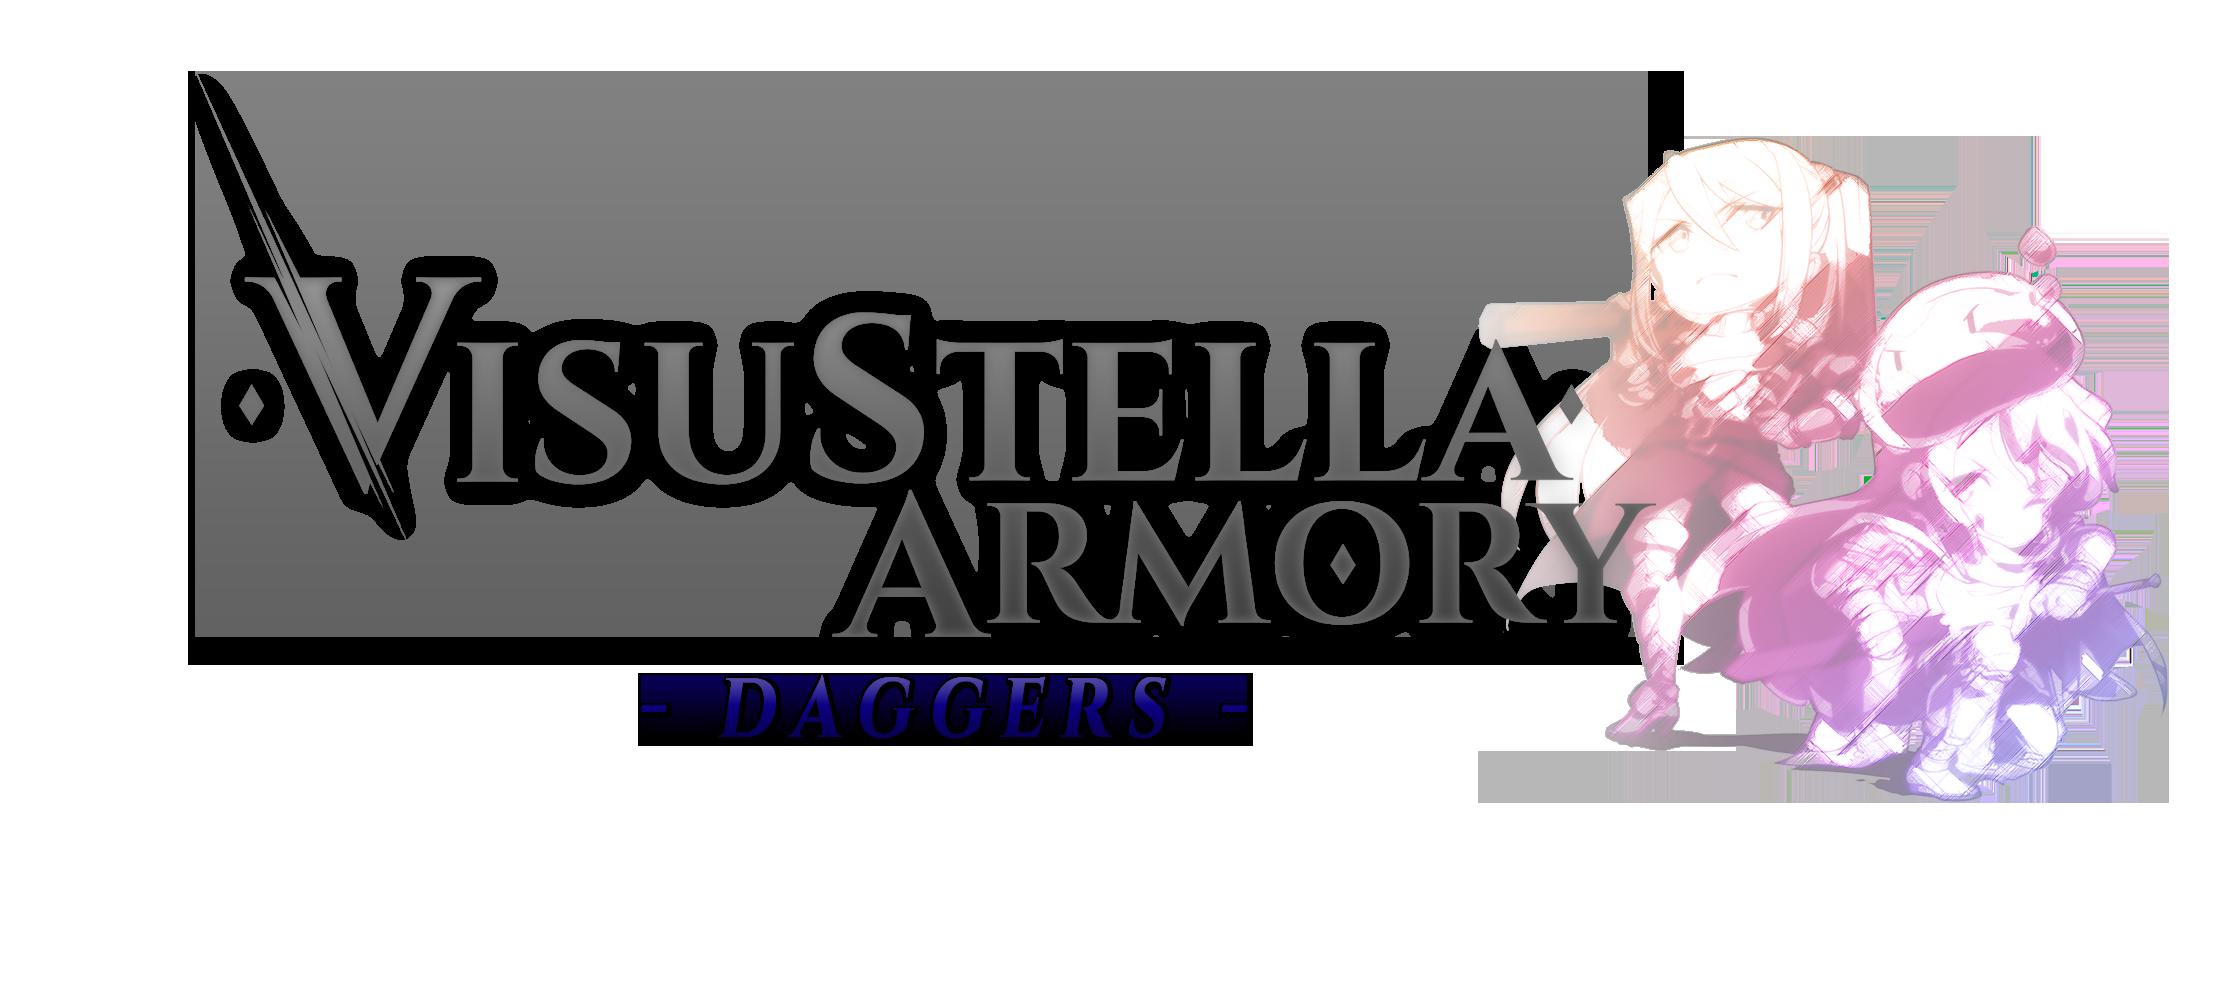 VisuStella Armory: Daggers